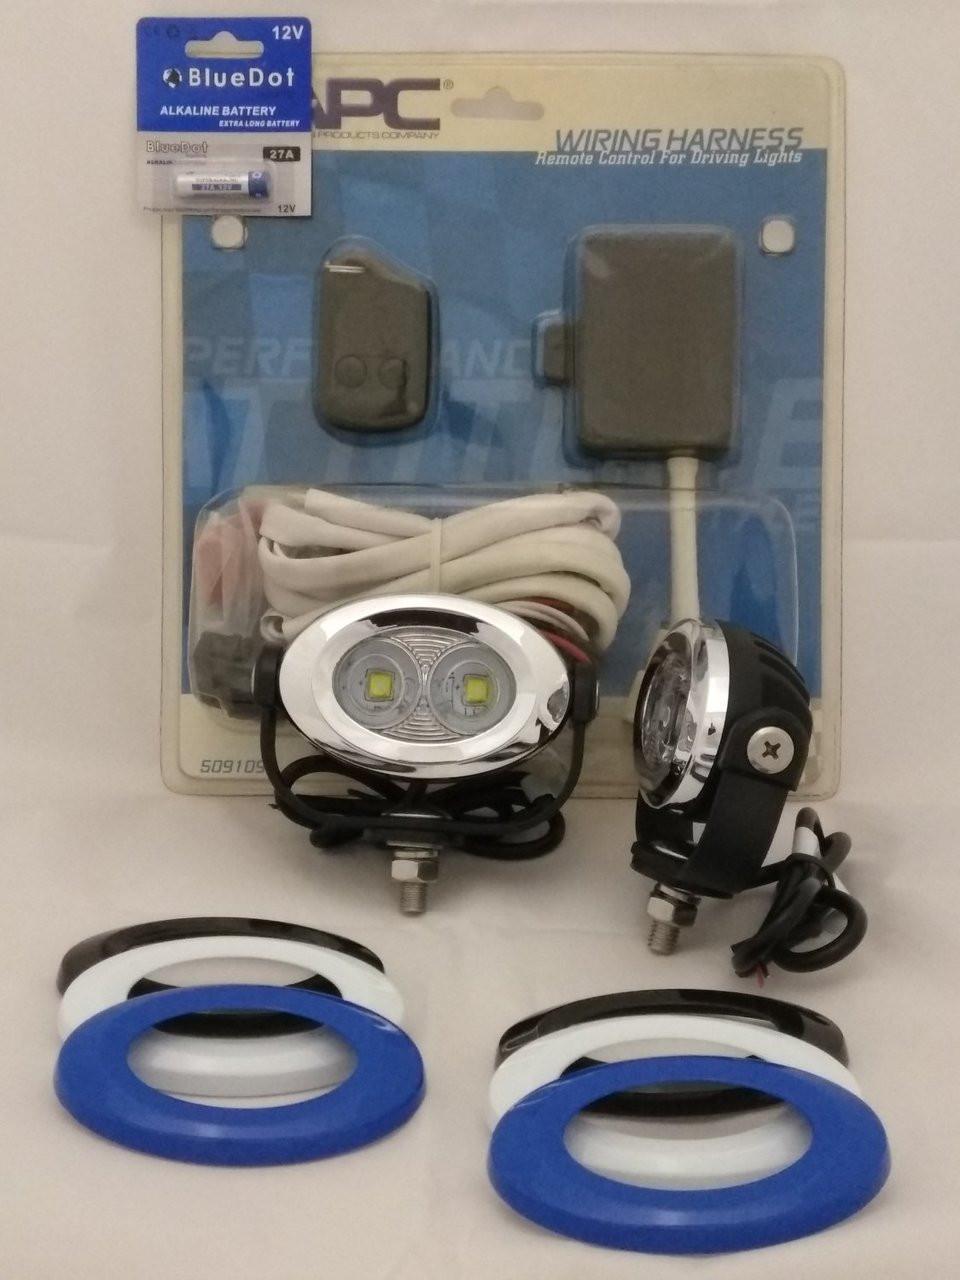 Bmw R1200rt Electrical Wiring Diagram Bike The Wiring Diagrams Inside